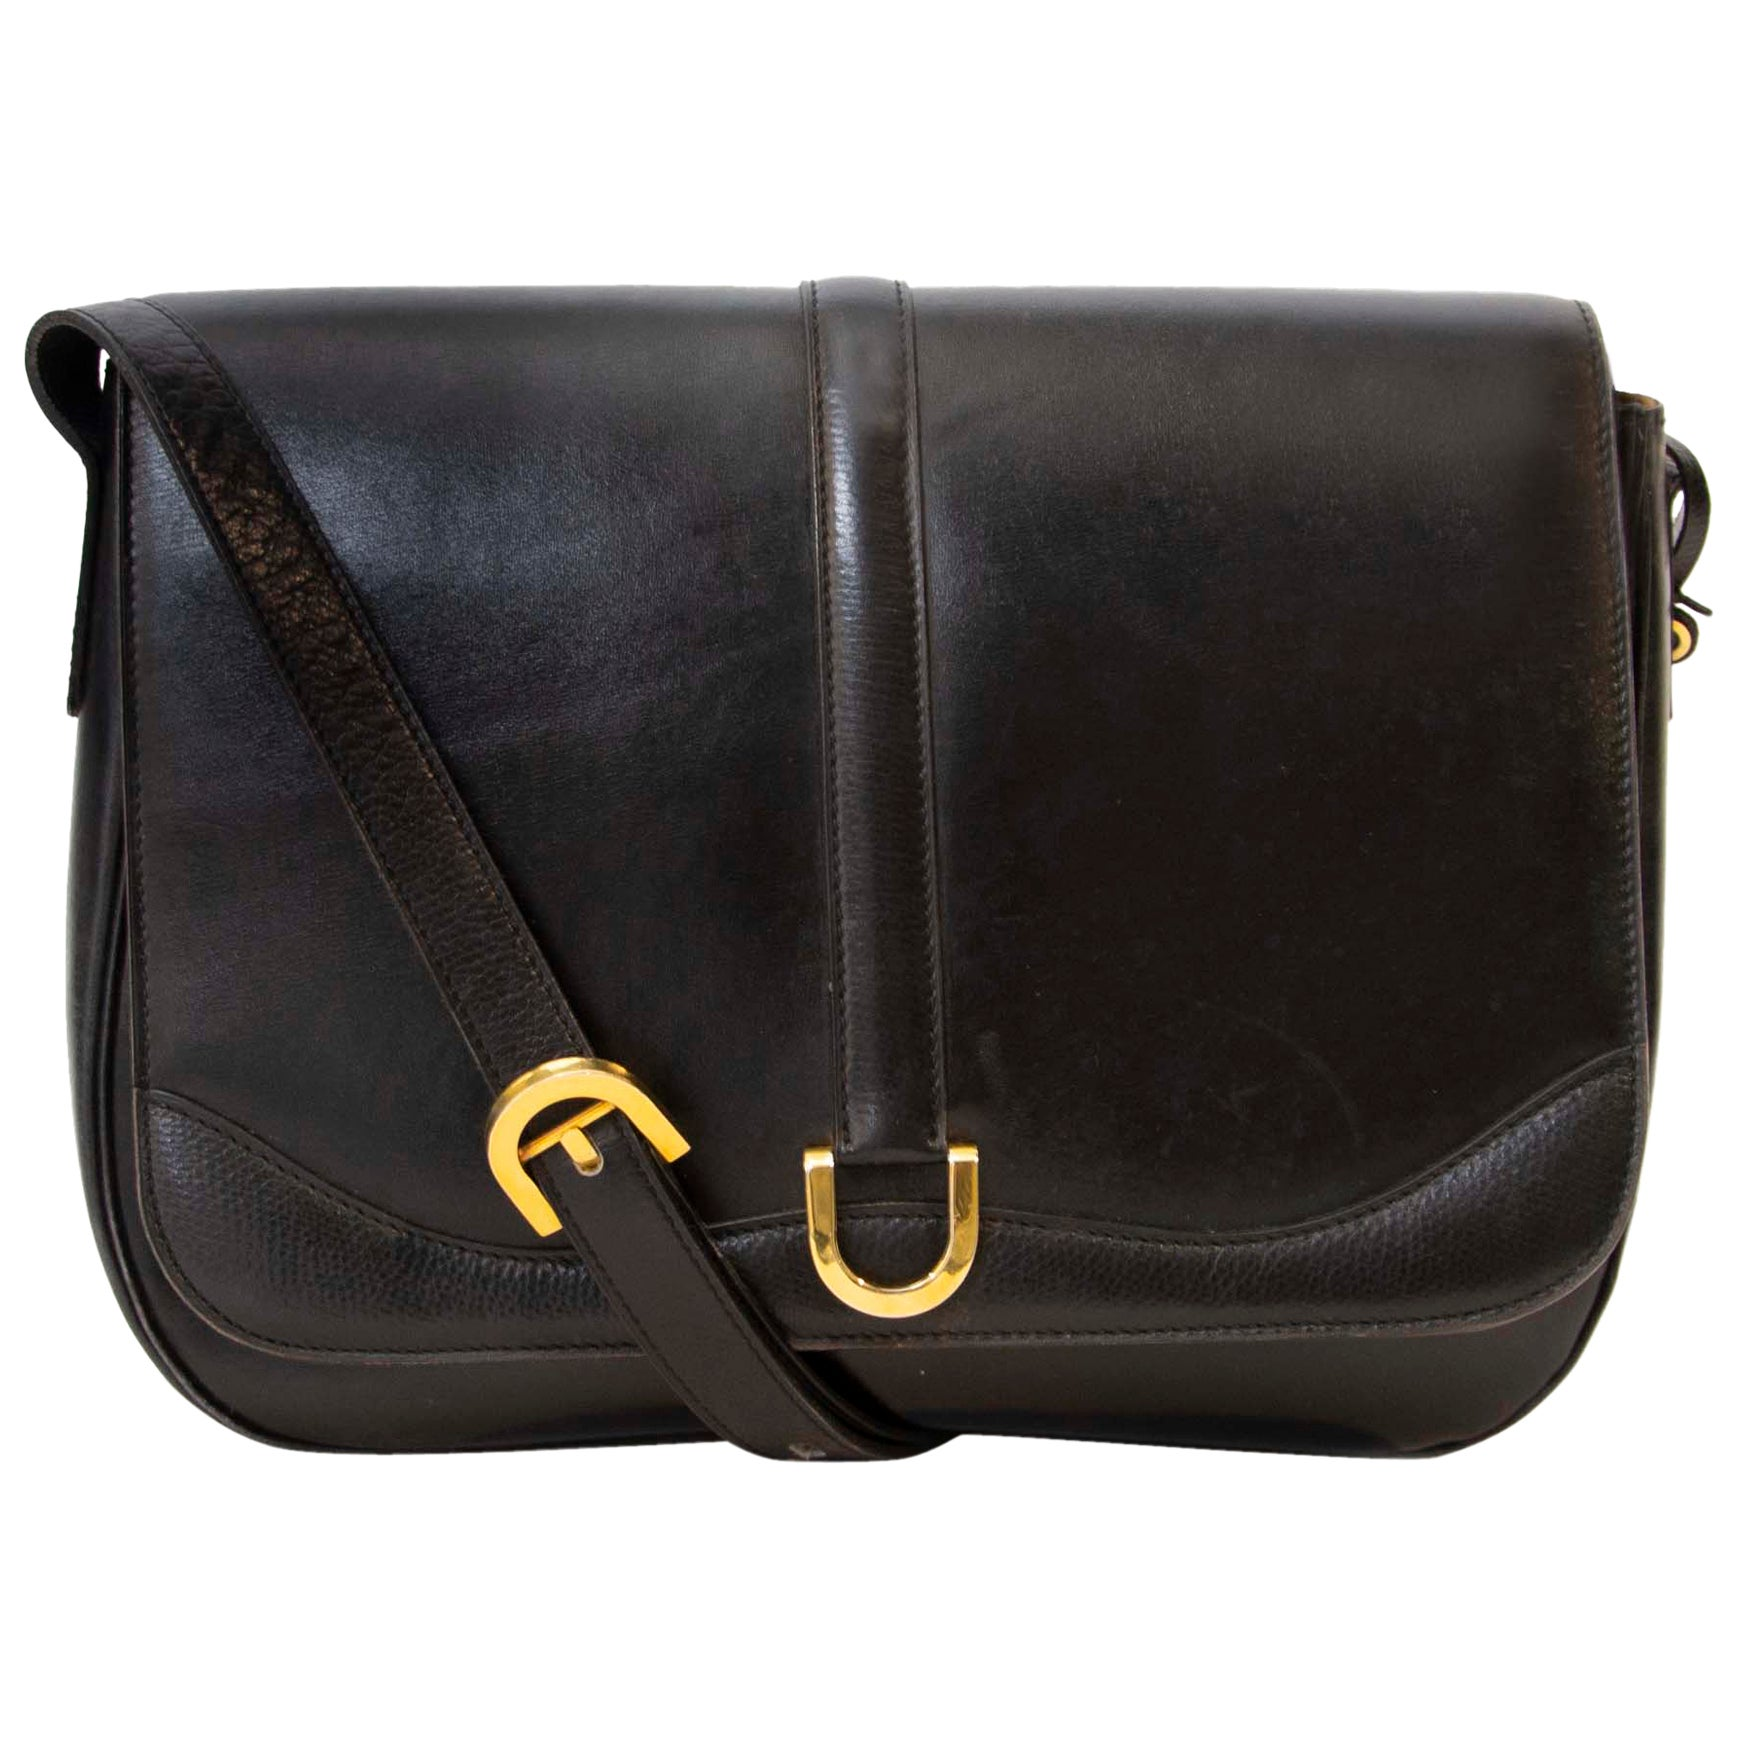 Delvaux Black Box Calf Cross Body Bag